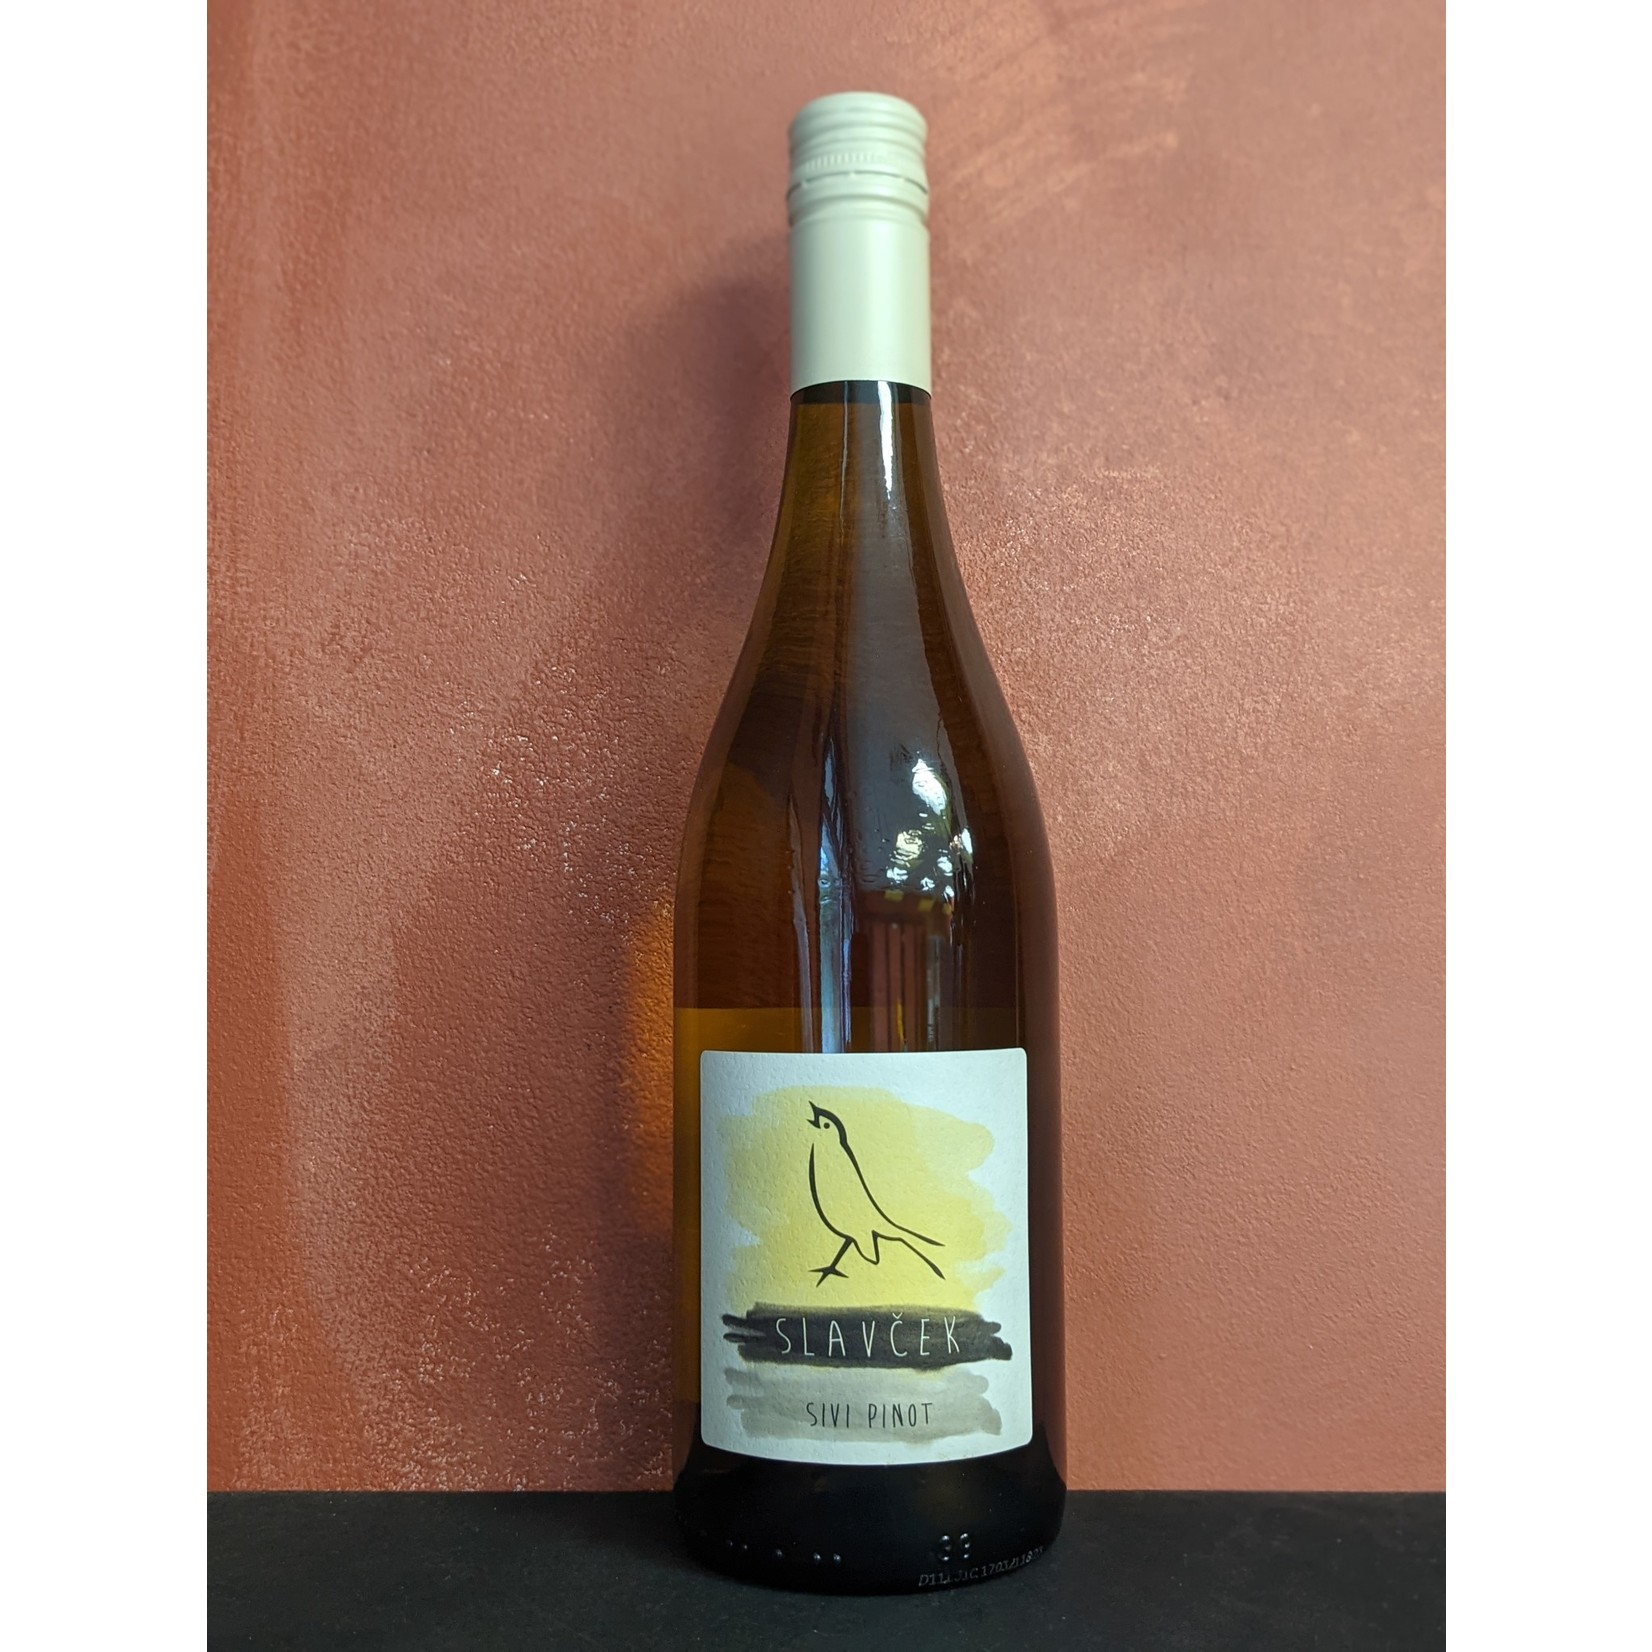 2020 Sivi Pinot, Slavcek